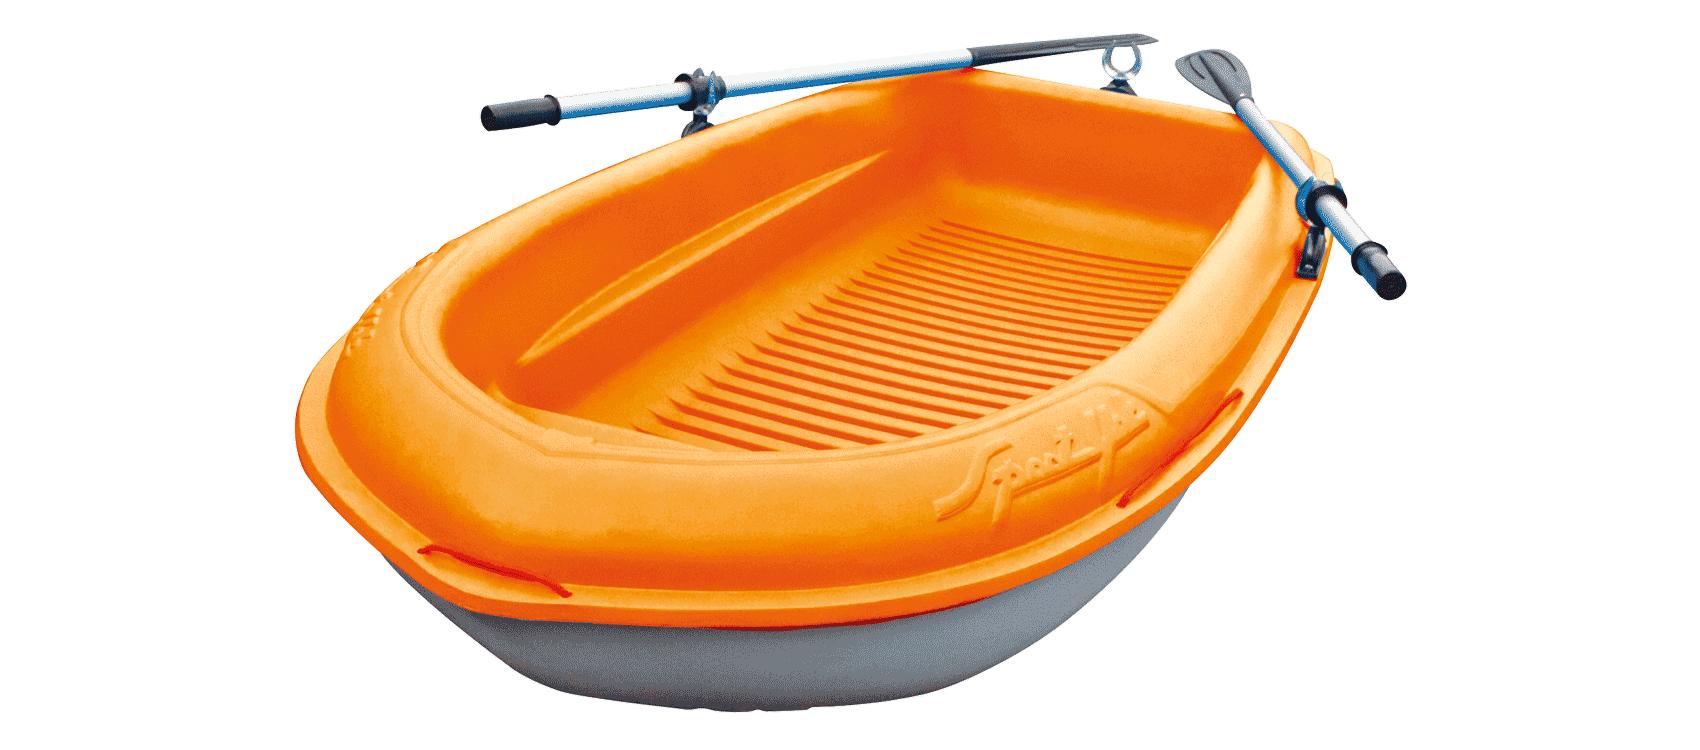 Bic 213 Fishing Boat - Orange